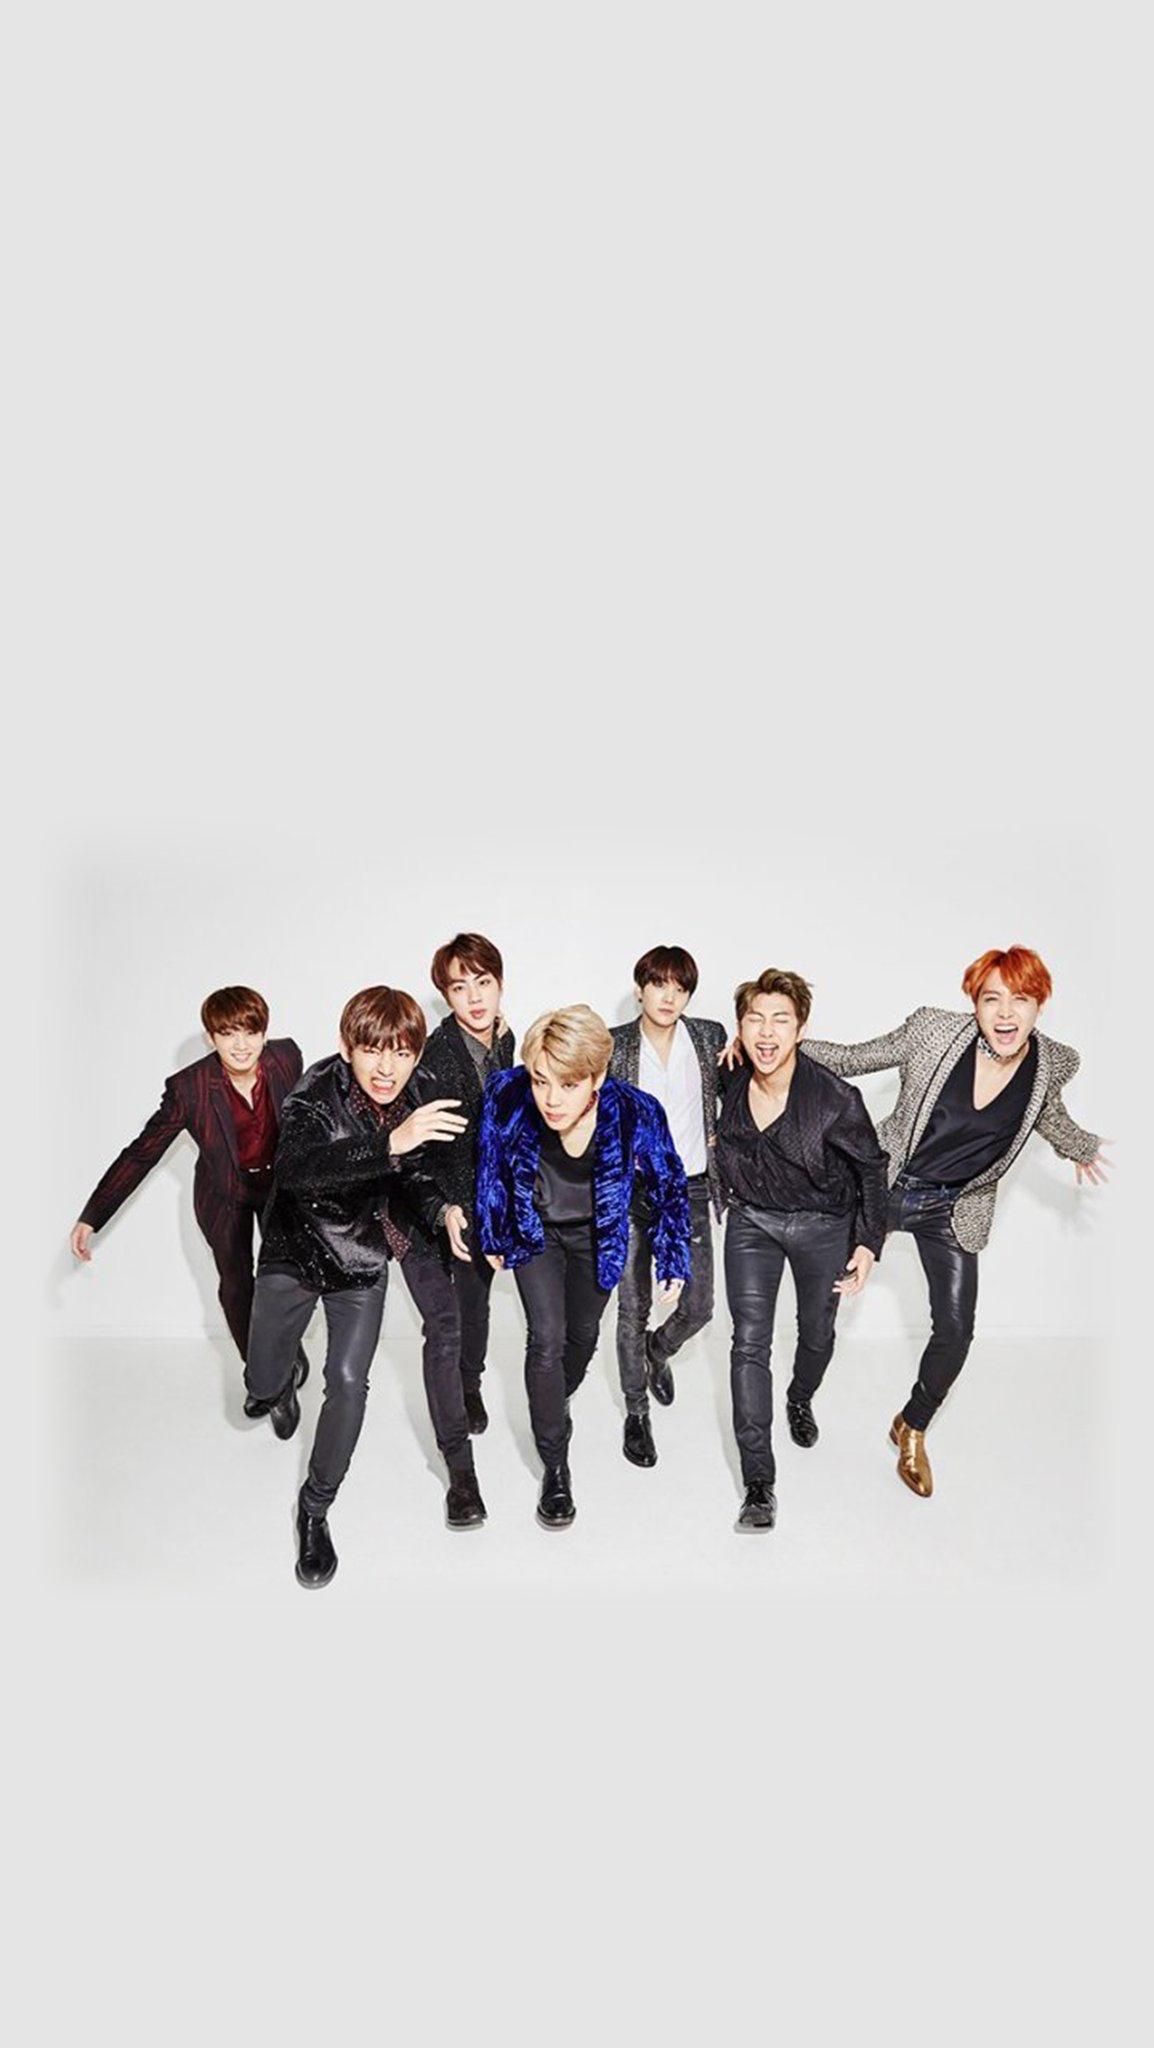 BTS-wallpaper-wp5603634